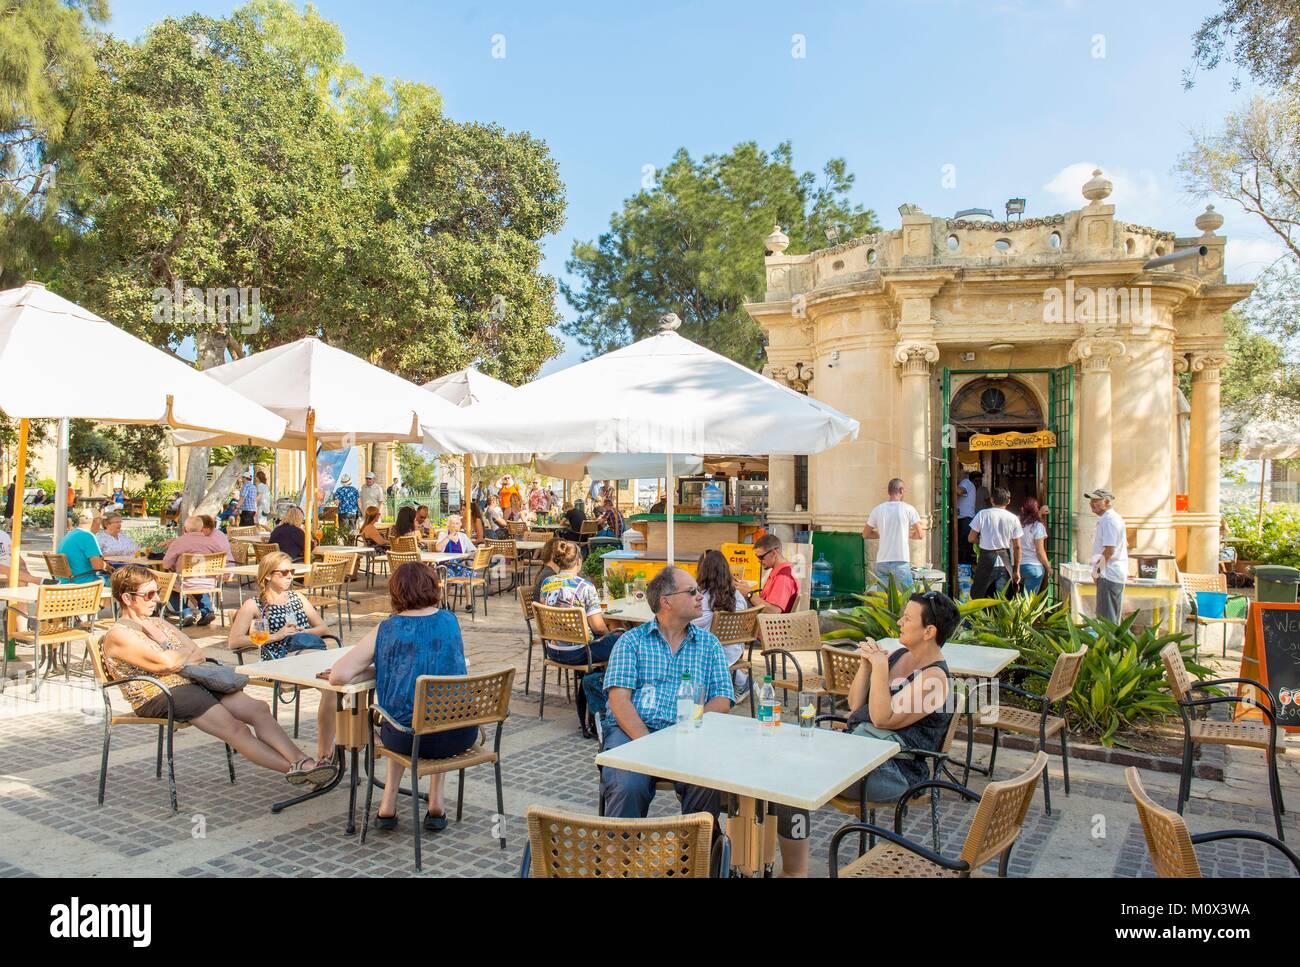 Malta,Valletta,city listed as World Heritage by UNESCO,Upper Barraca garden - Stock Image